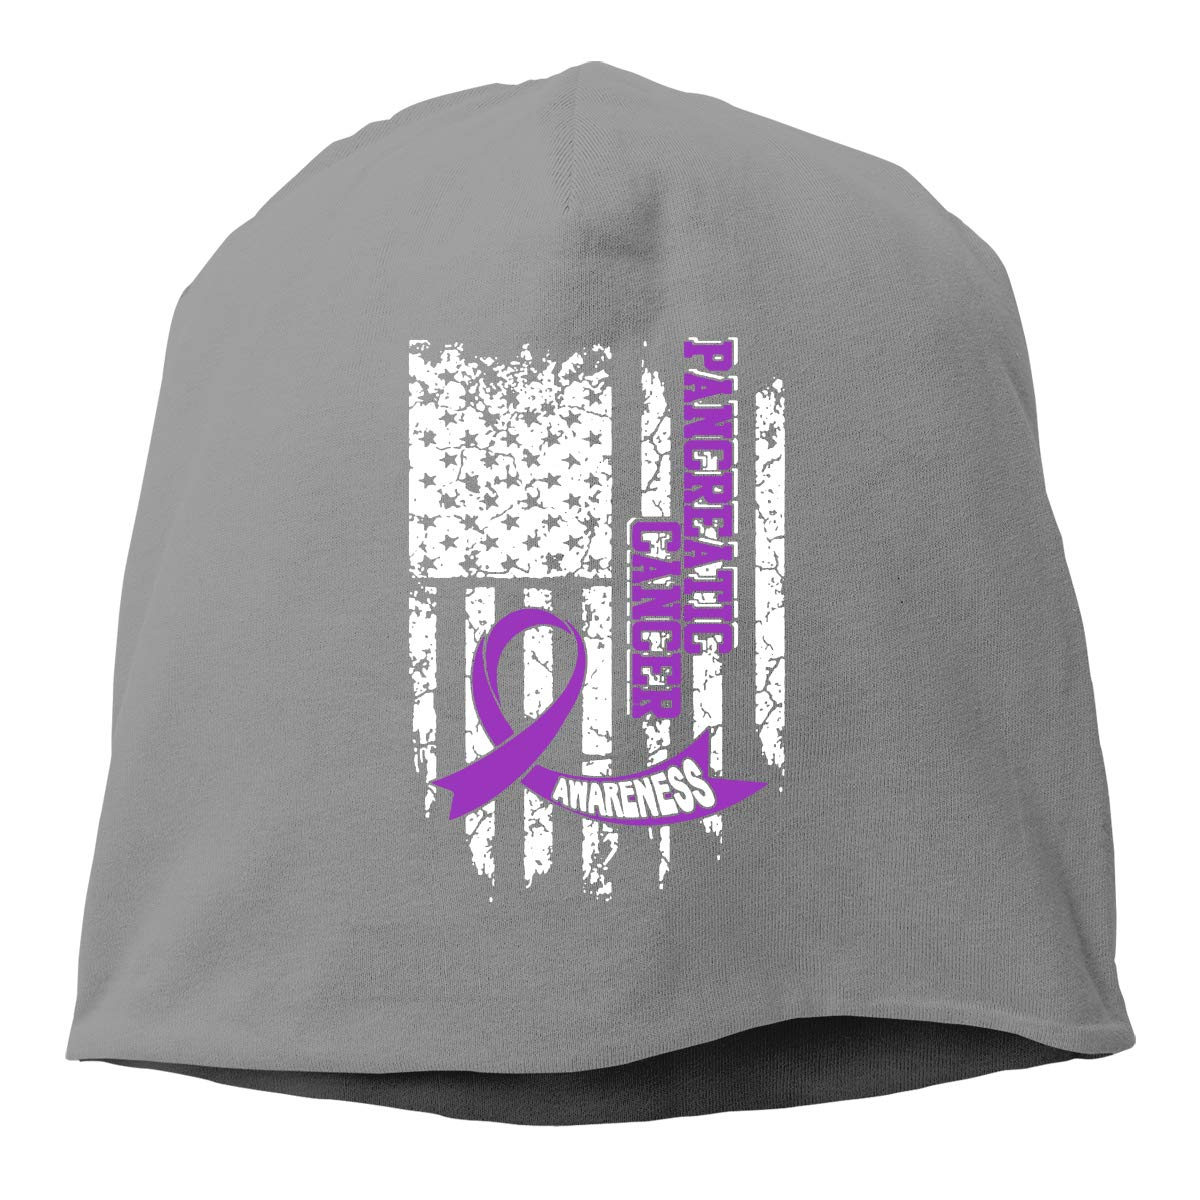 TLPM9LKMBM USA Flag Pancreatic Cancer Awareness Beanie Skull Cap for Women and Men Winter Warm Knit Hat